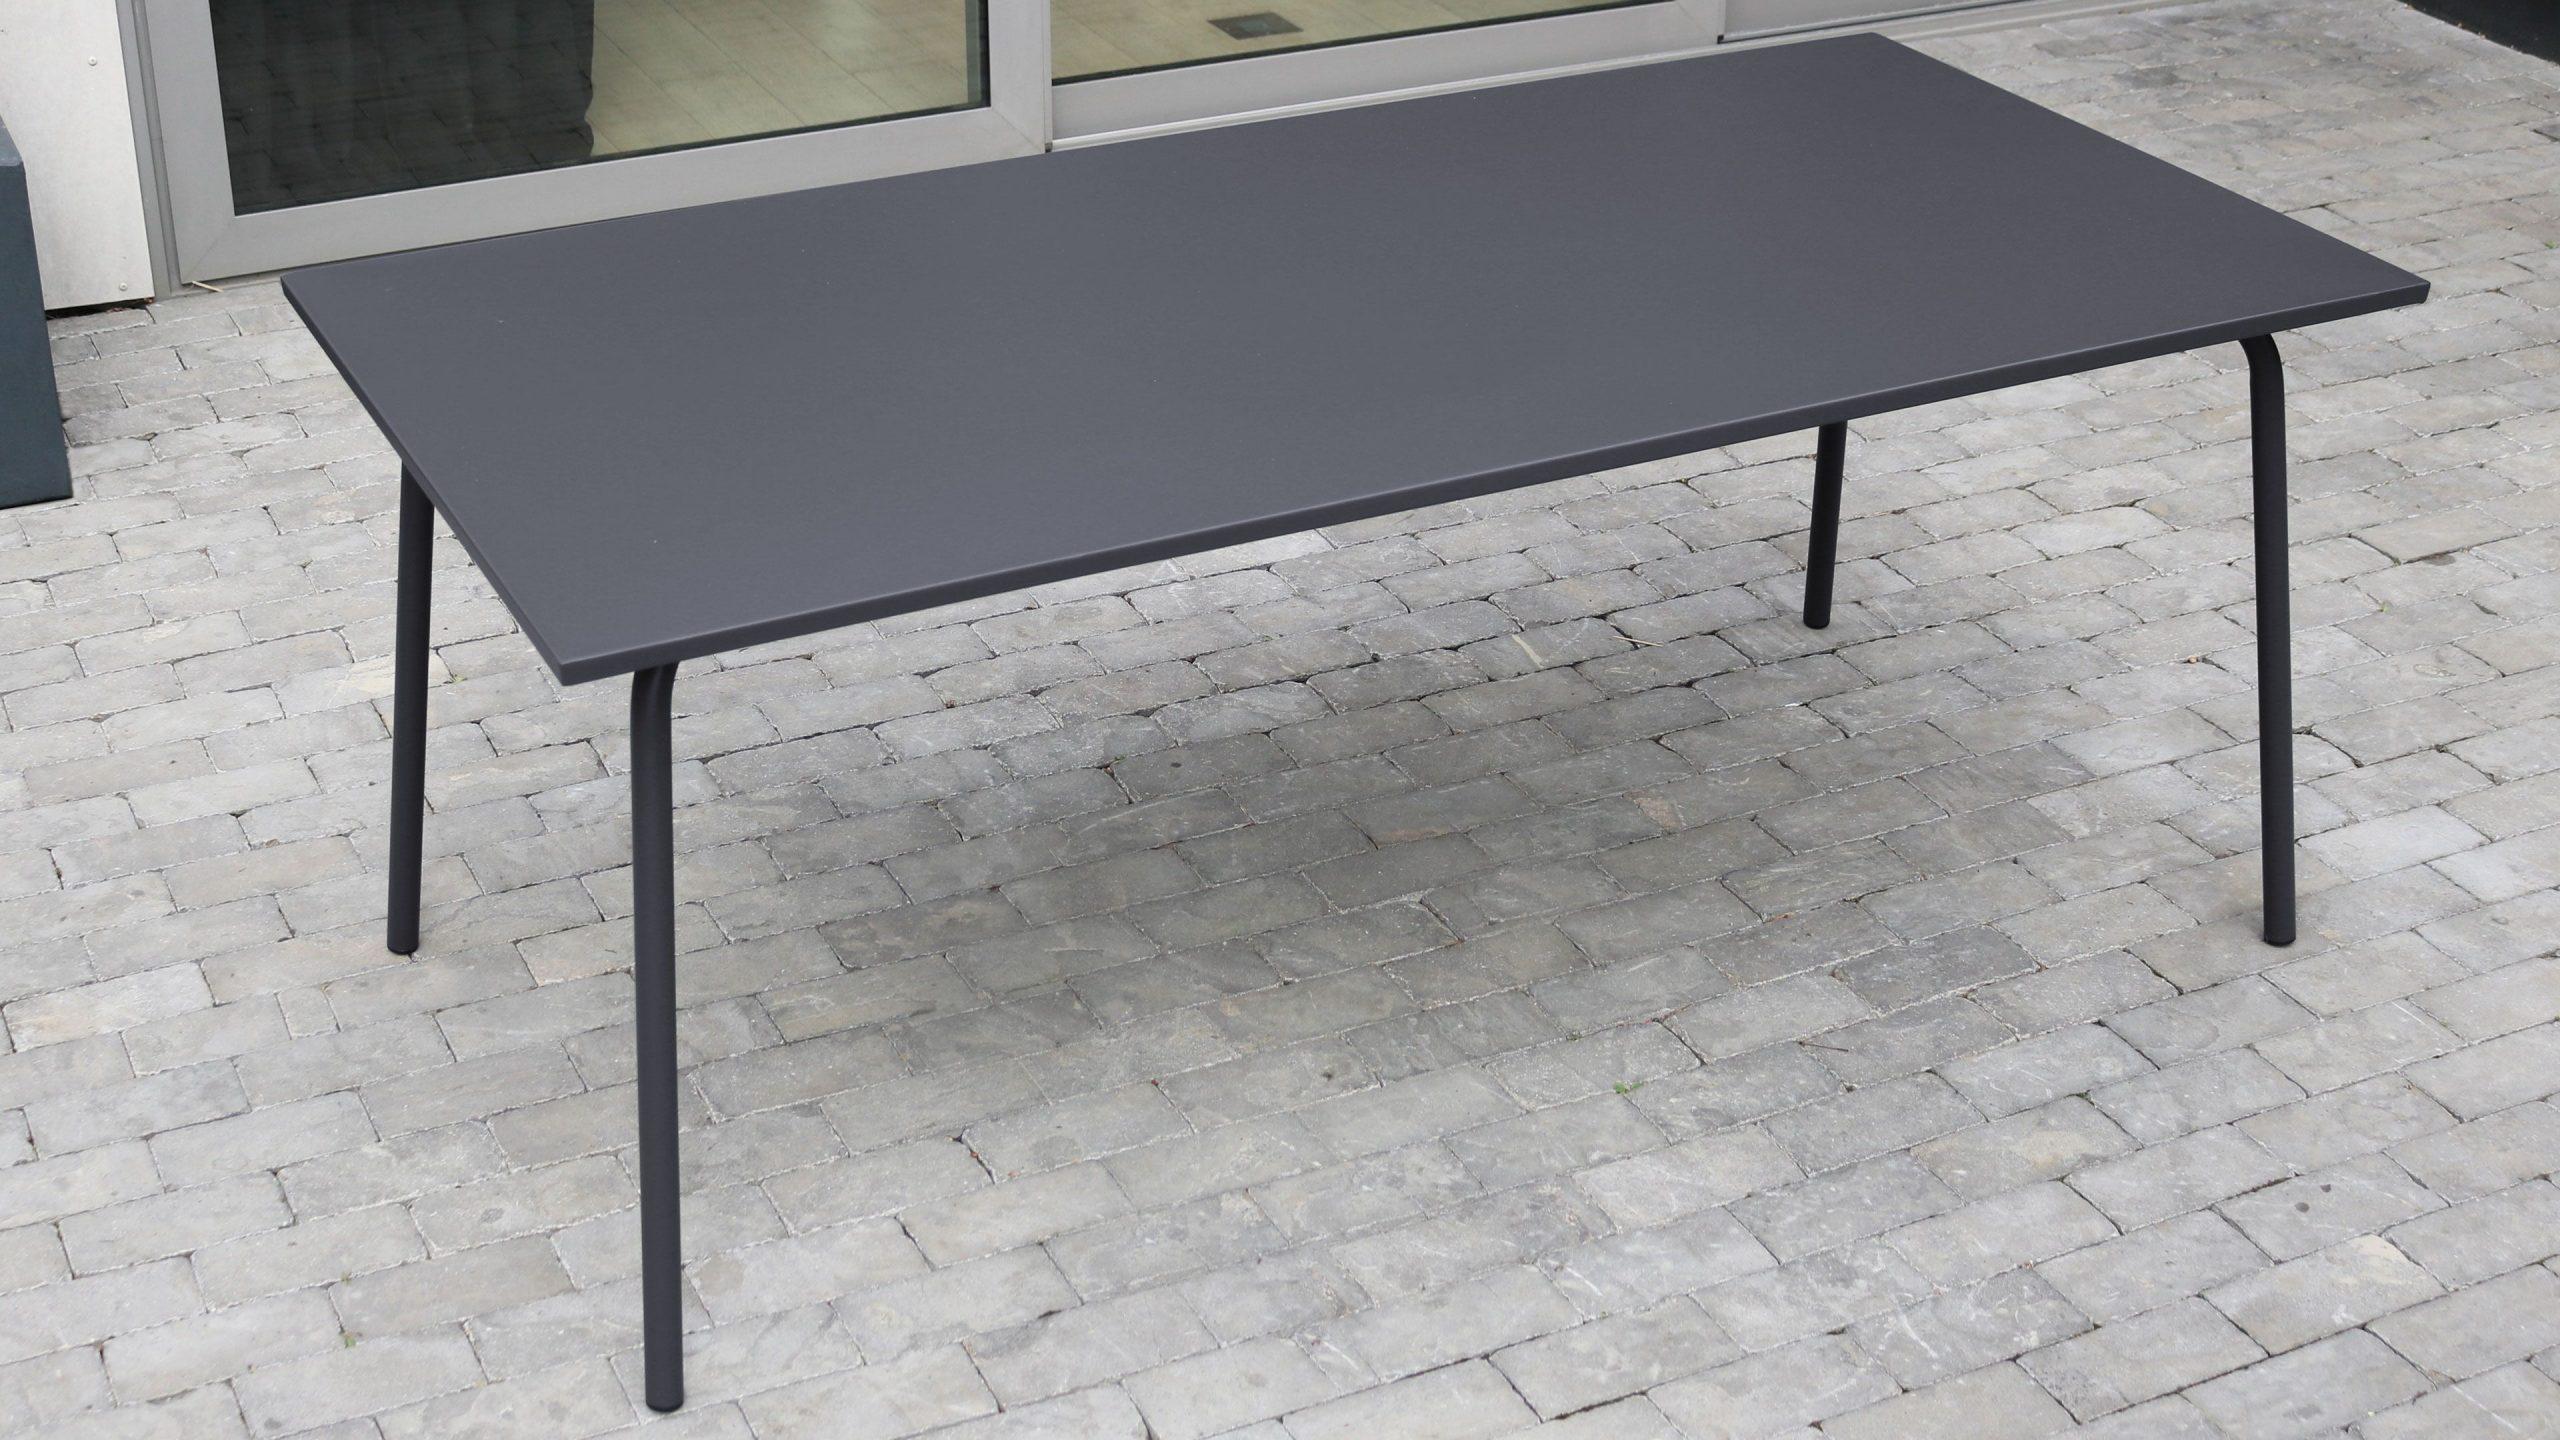 Salon De Jardin Metal Table Et Fauteuils intérieur Table De Jardin En Metal